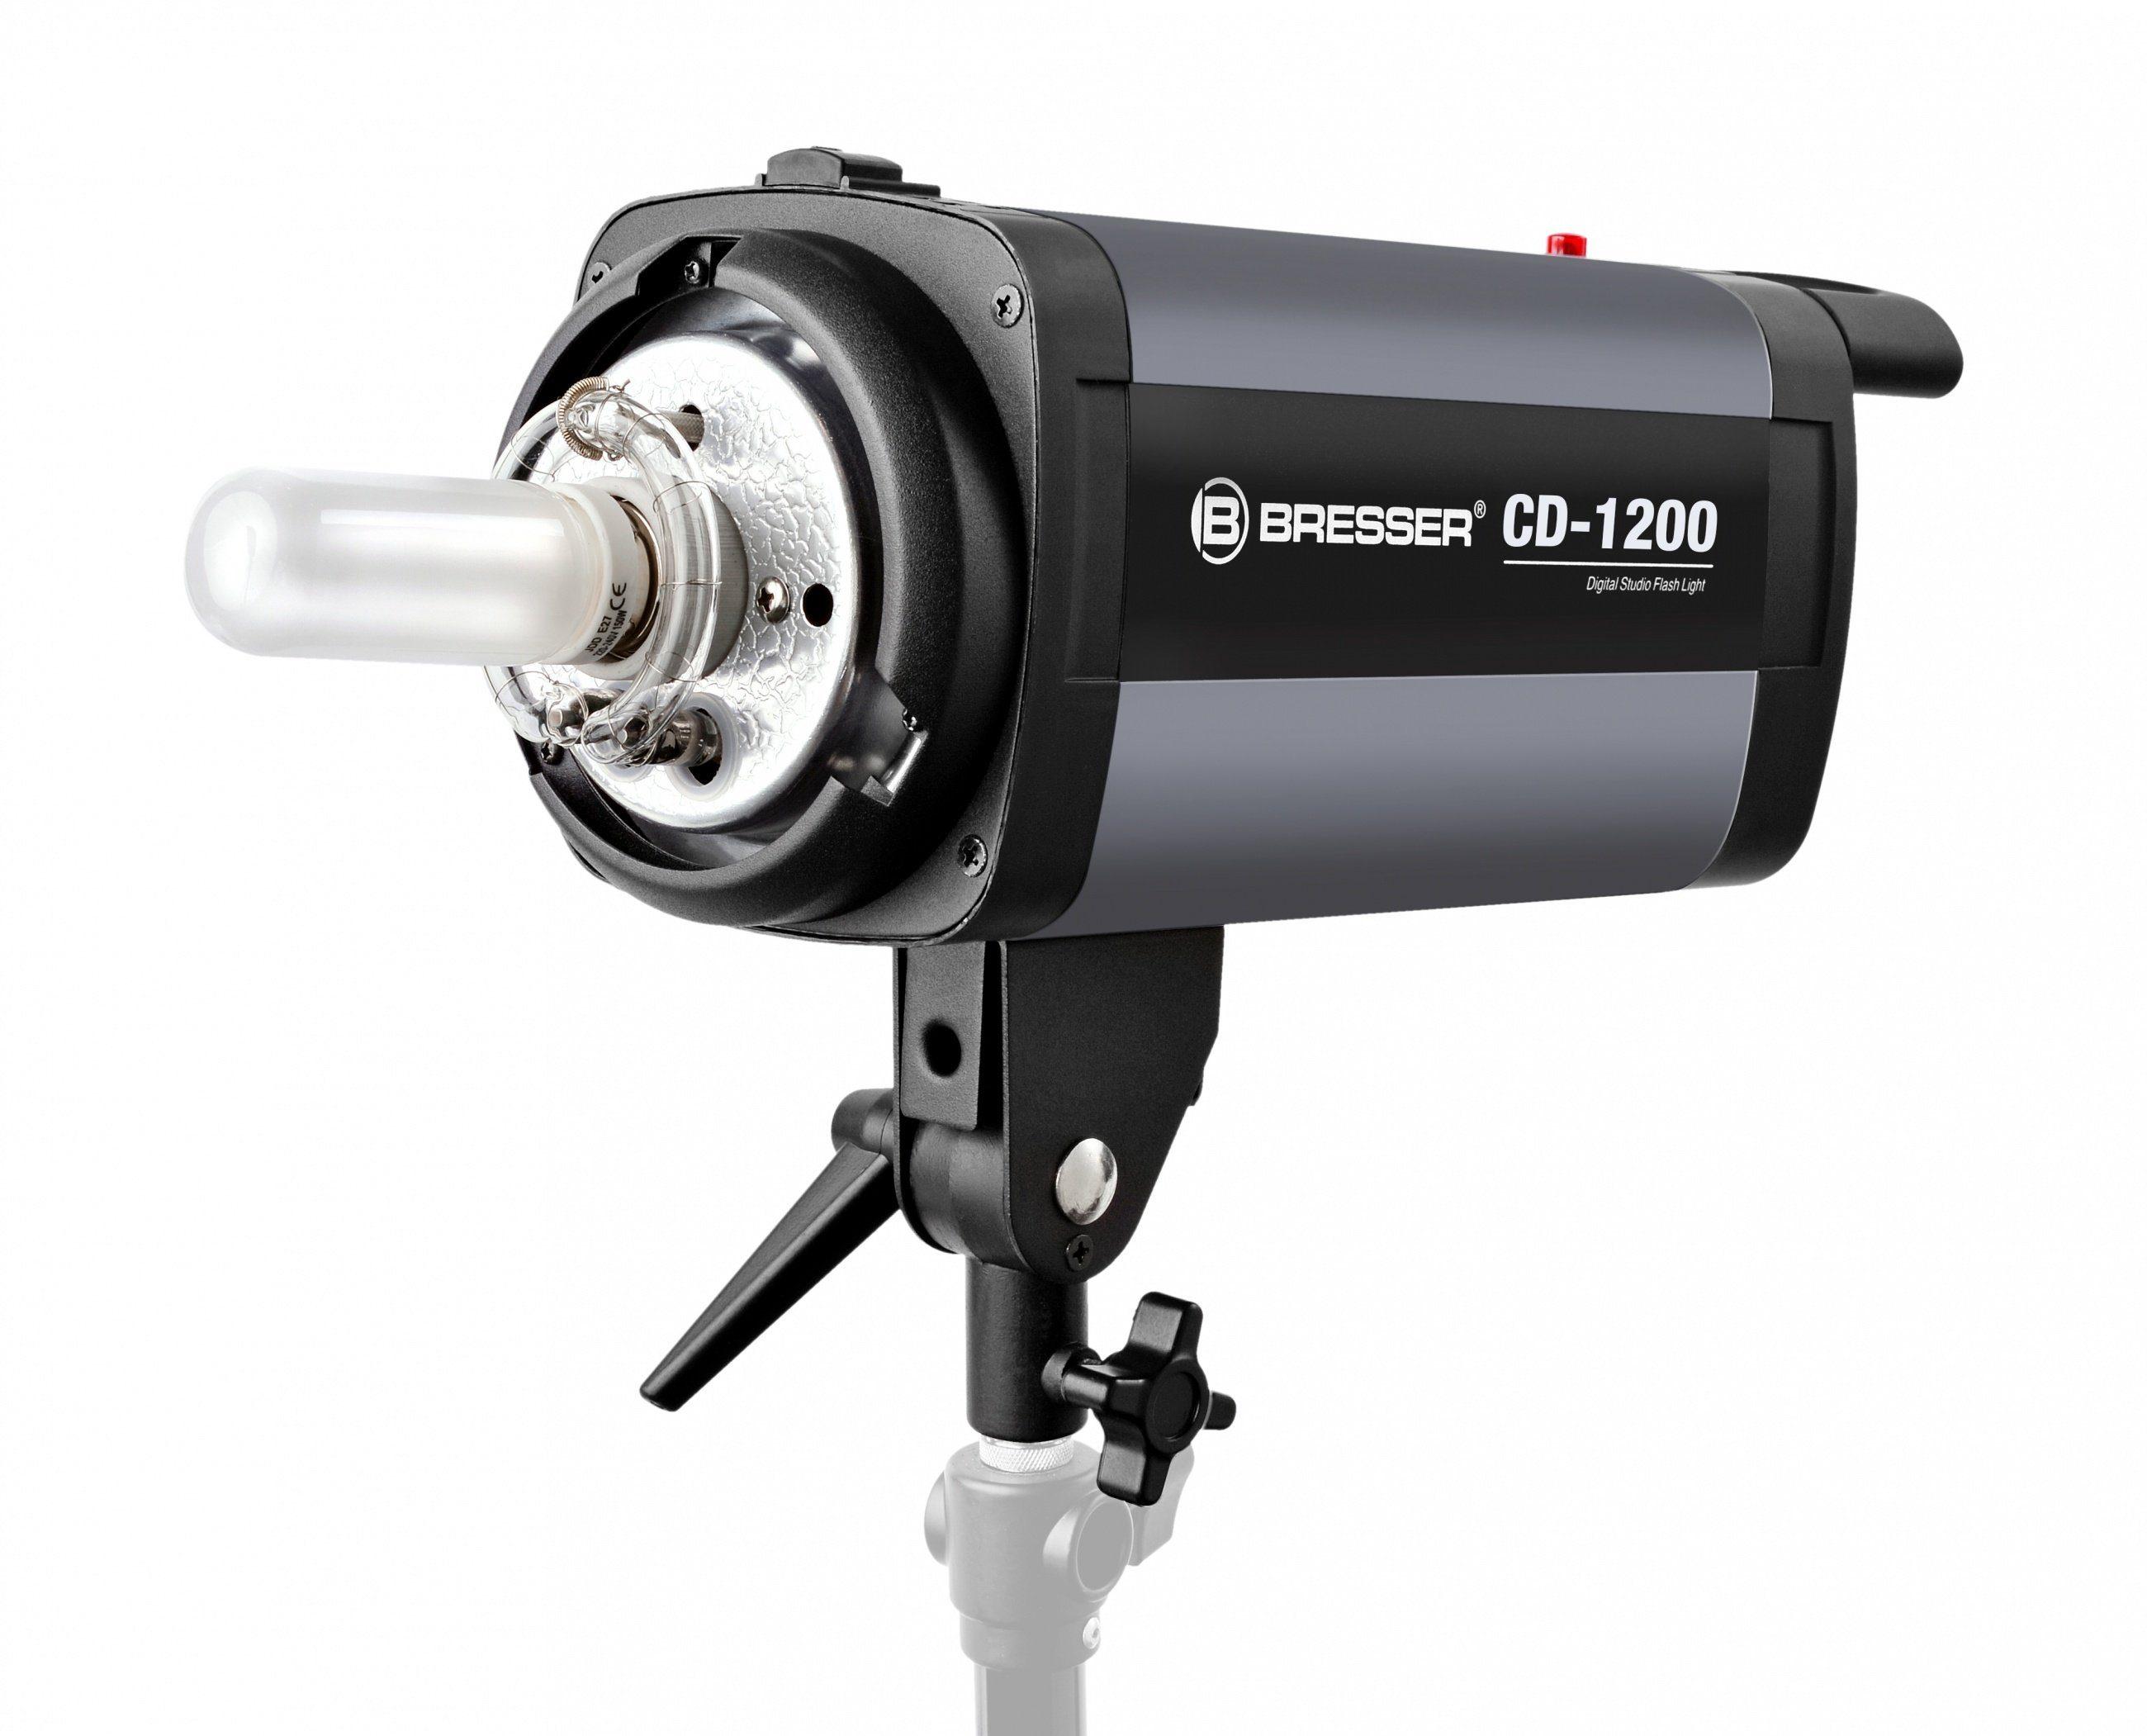 Bresser Fotostudio »CD-1200 digitaler Studioblitz«